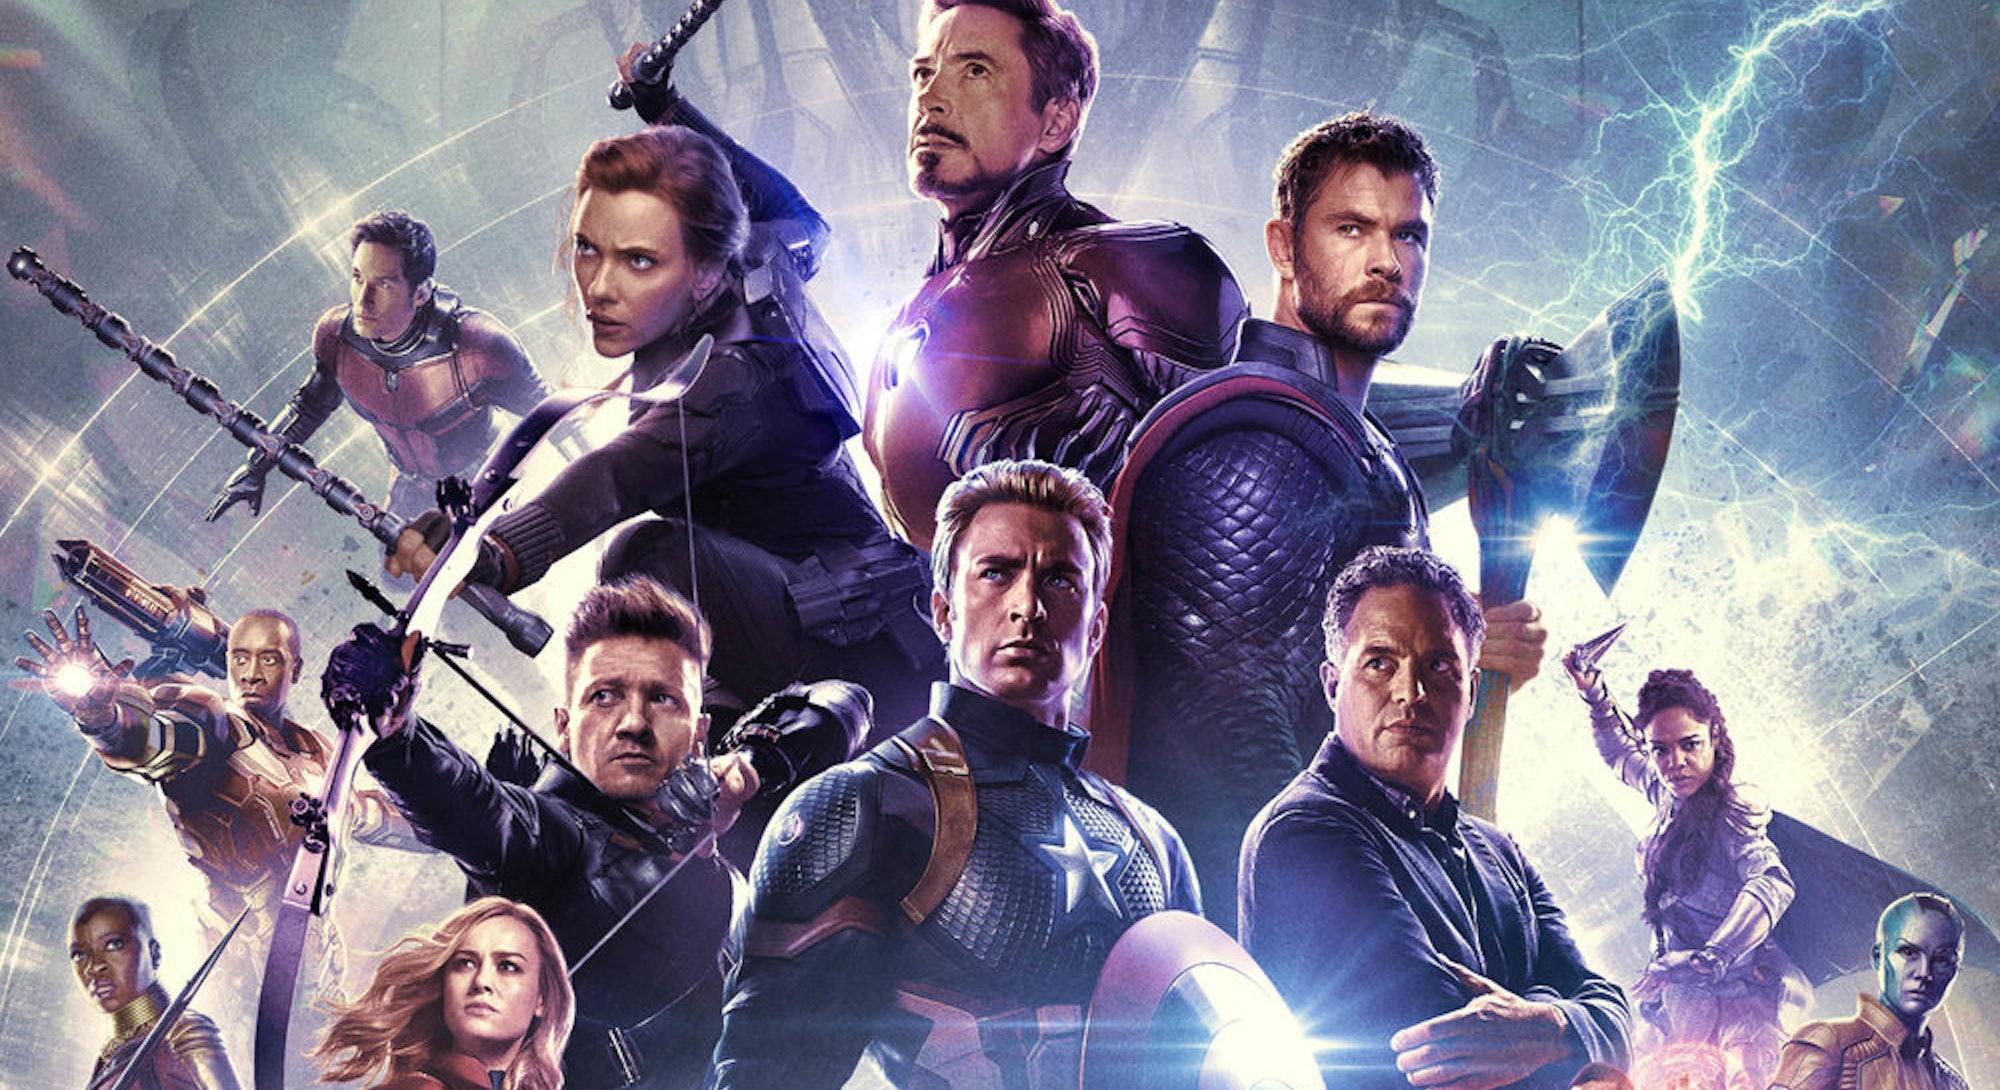 marvel's avengers endgame character lineup movie poster